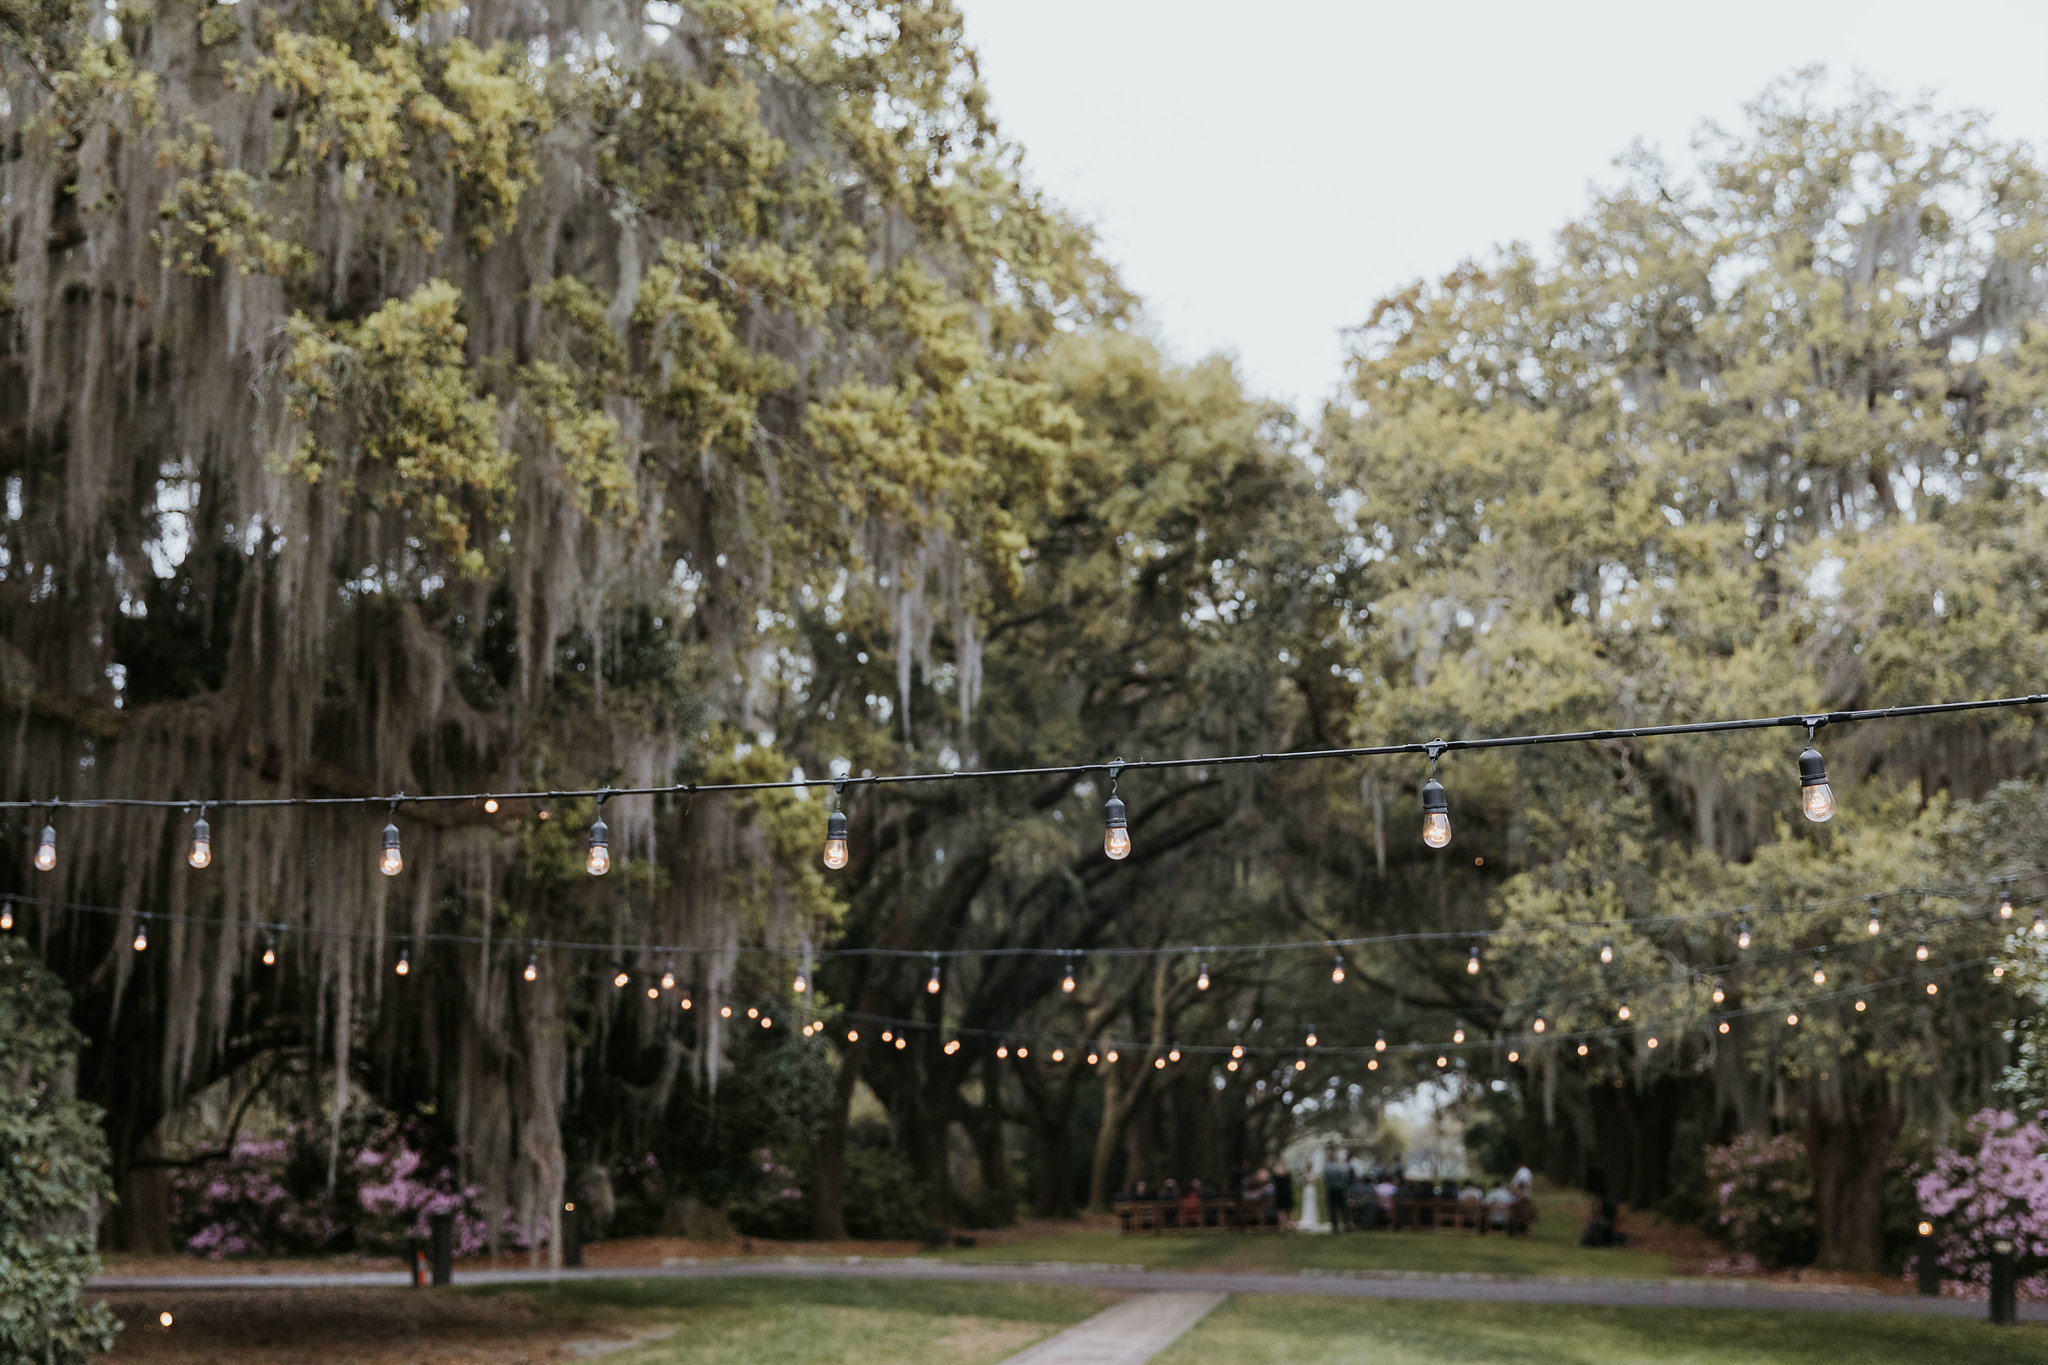 Legare-Waring-House-Charleston-SC-wedding-portrait-photography-463.jpg